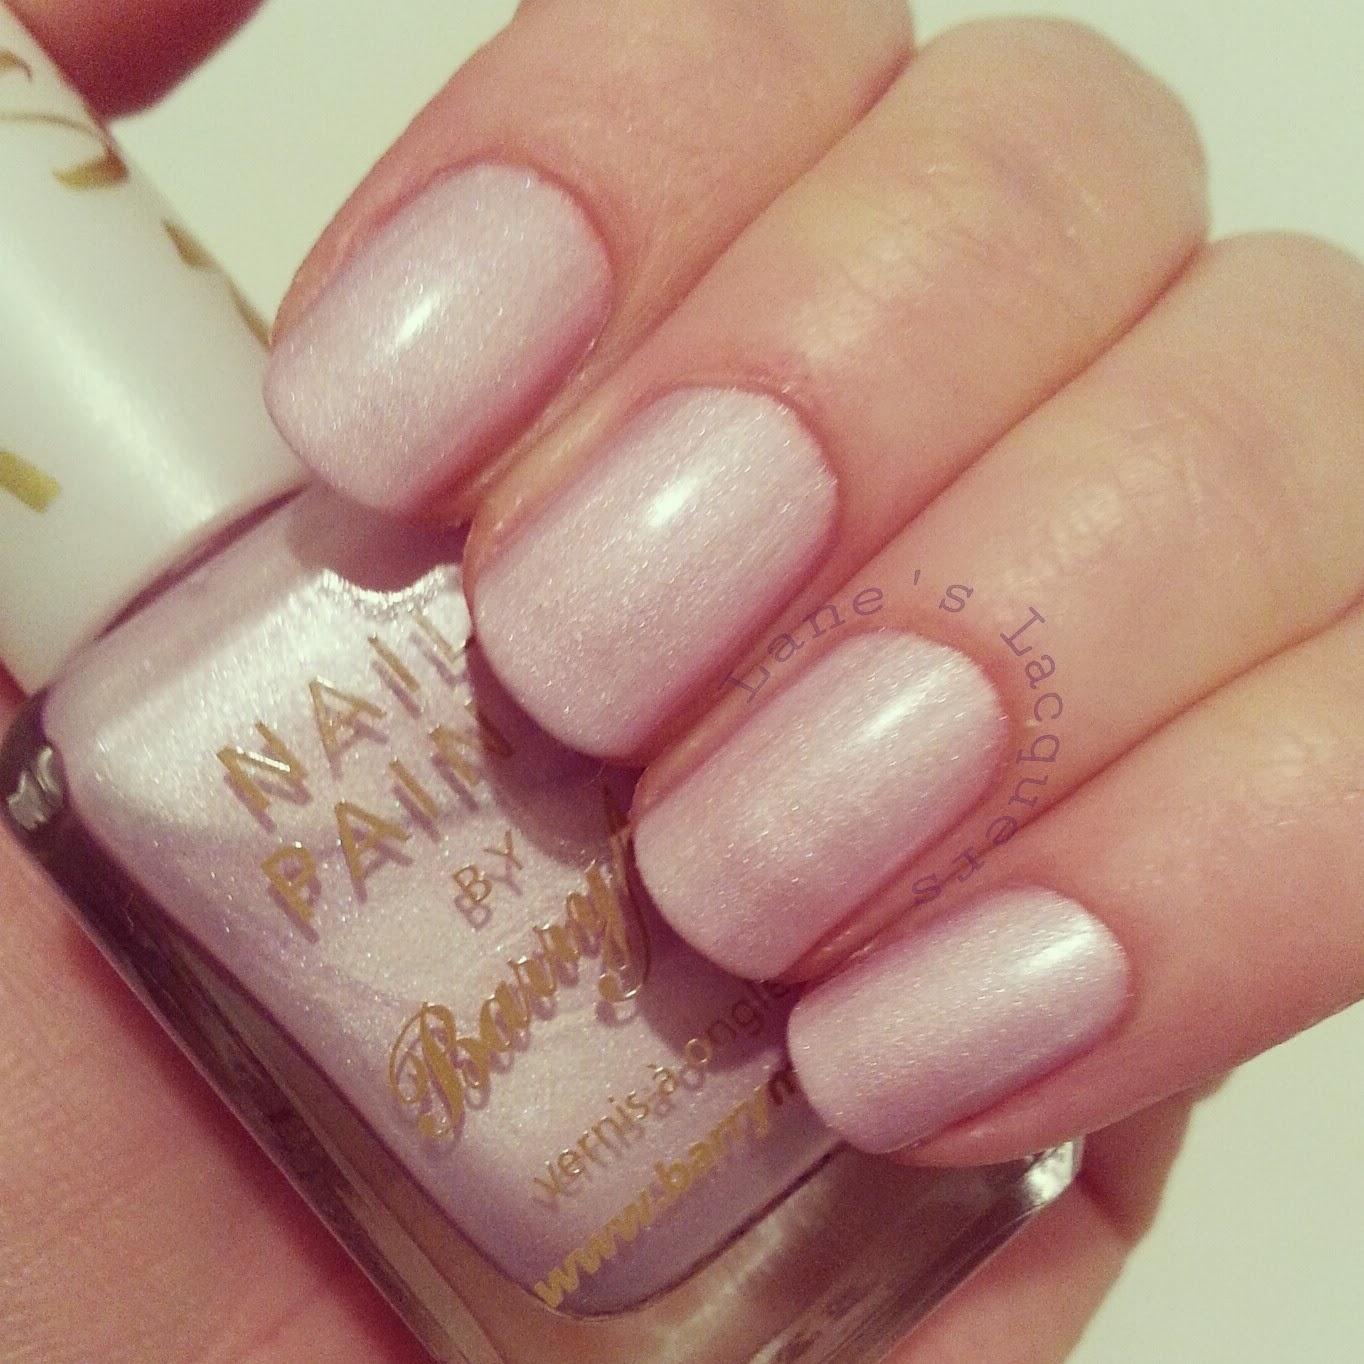 barry-m-silk-heather-swatch-nails